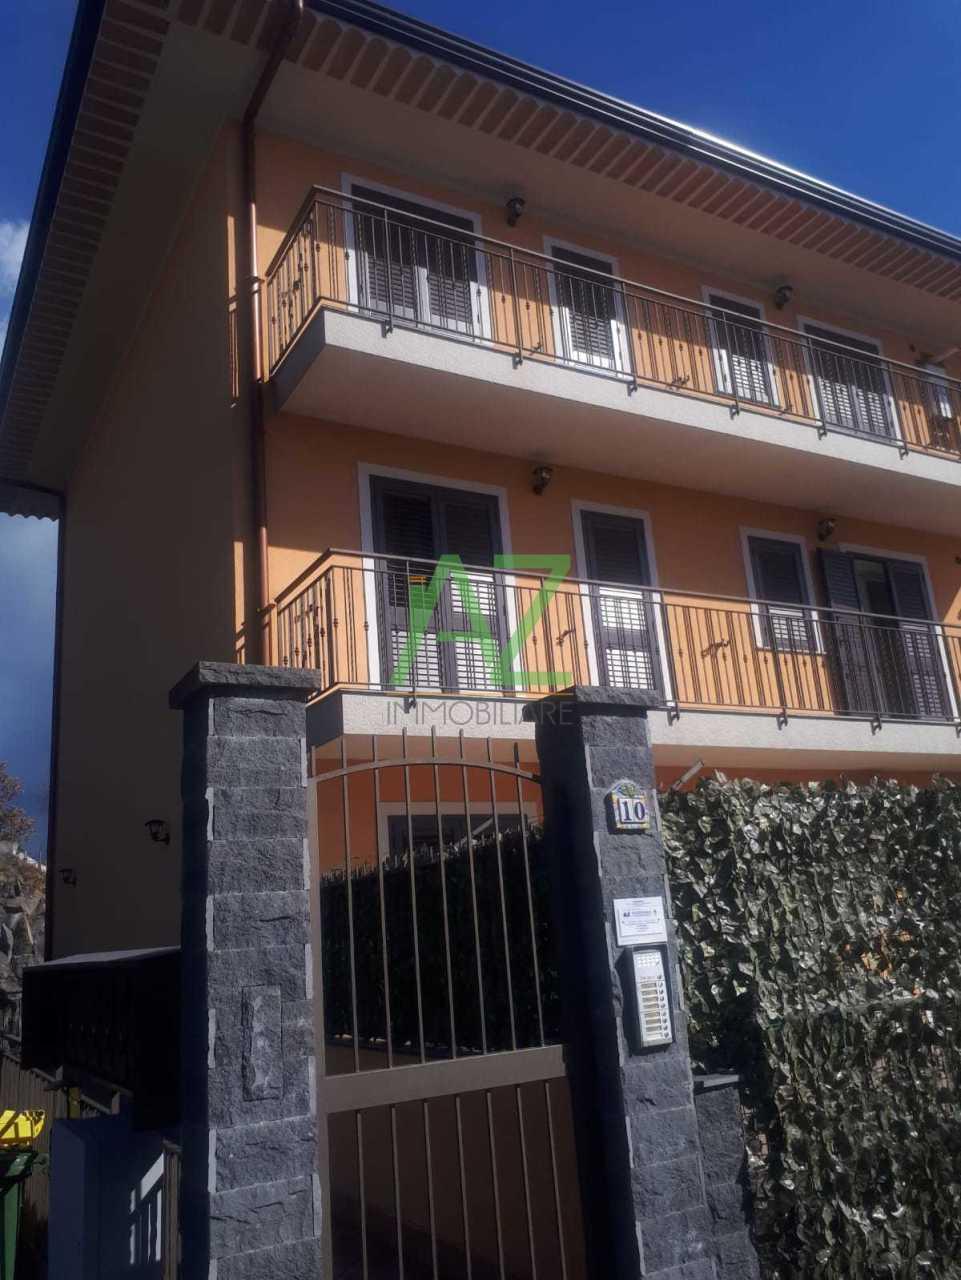 Appartamento a Sant'Anna, Belpasso